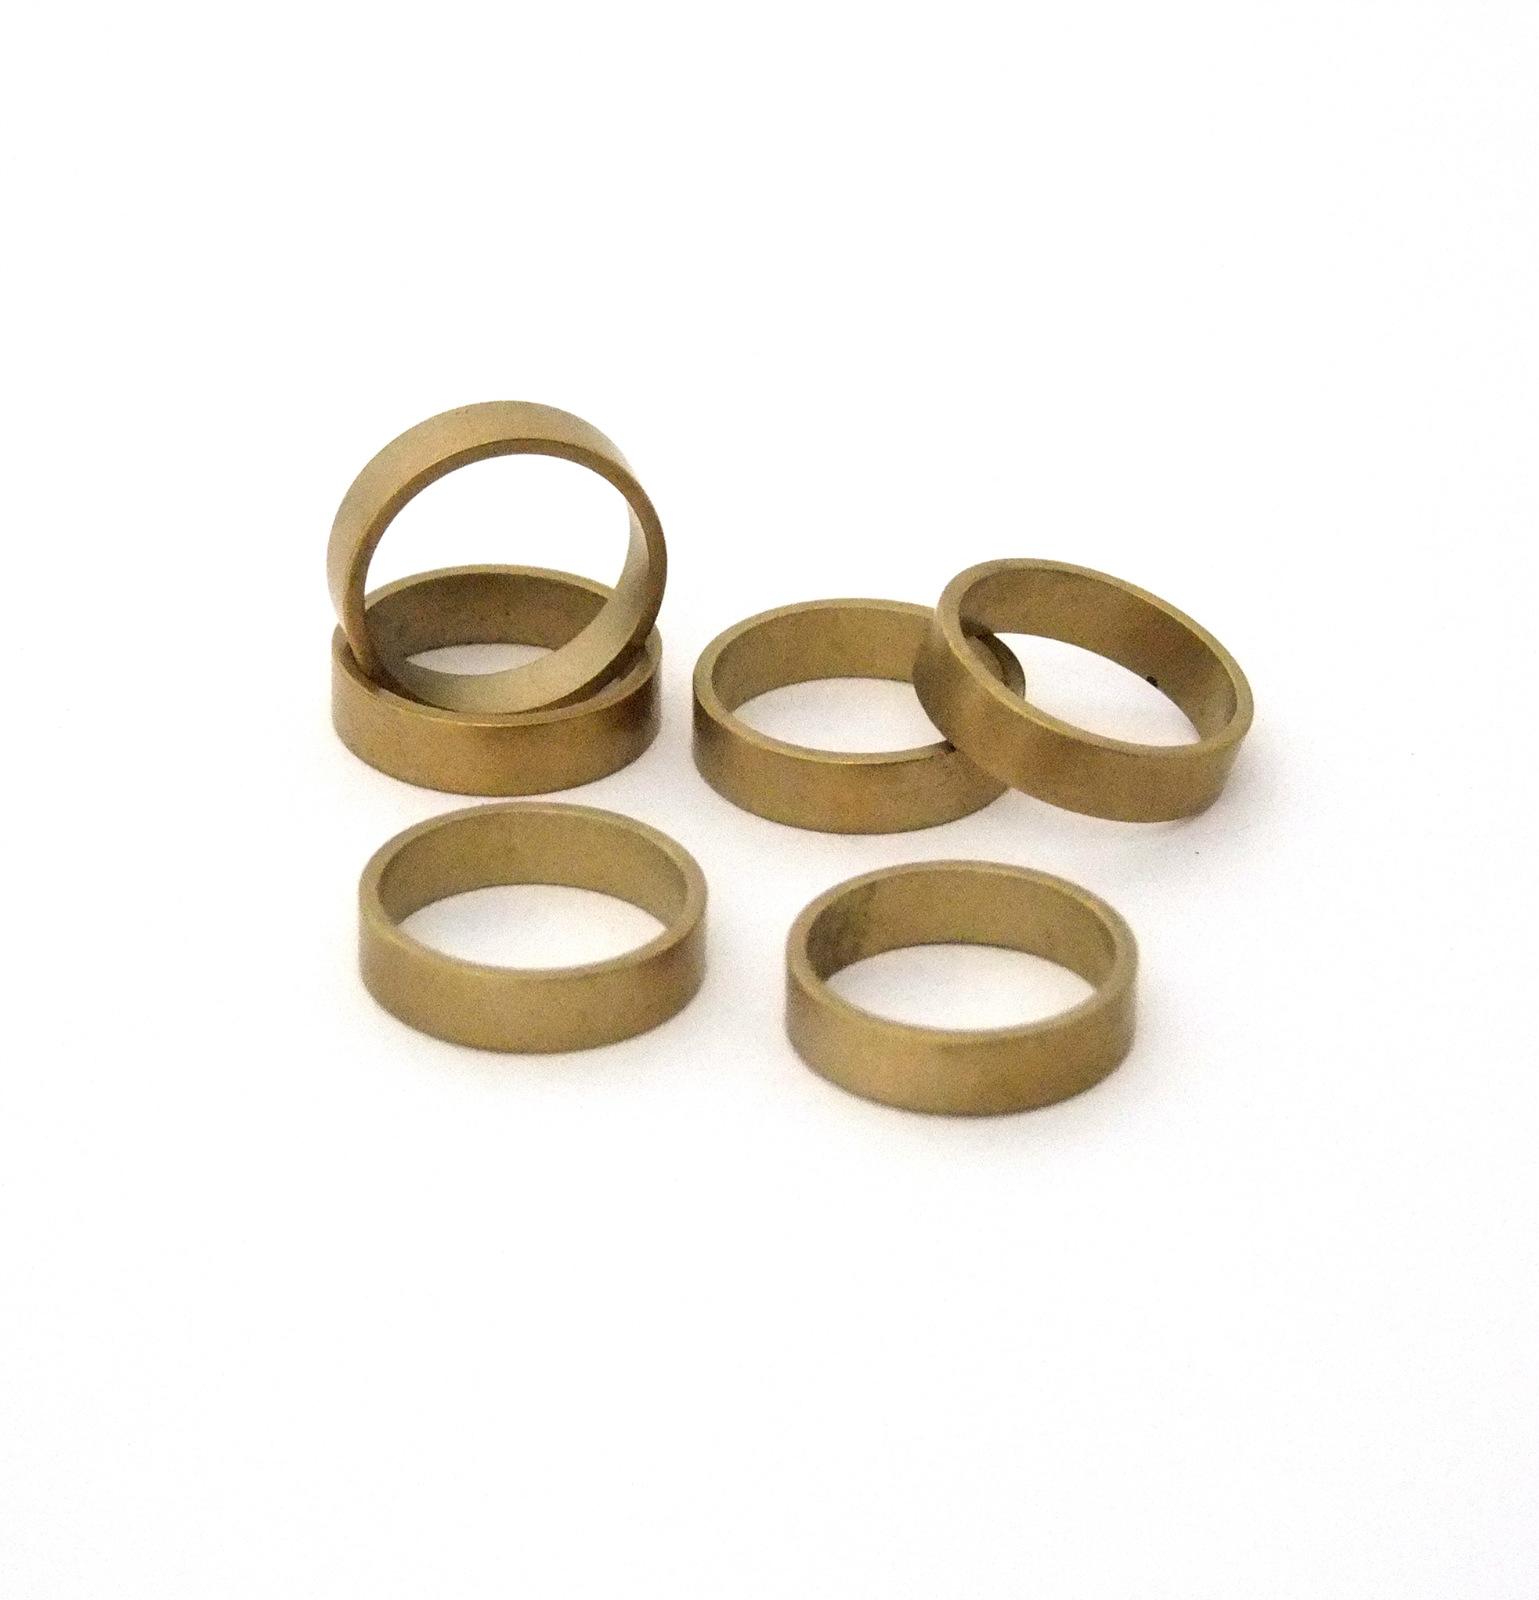 Raw Brass Bracelet Cuff Flat 1 inch Wide G53//1 2.5 inches